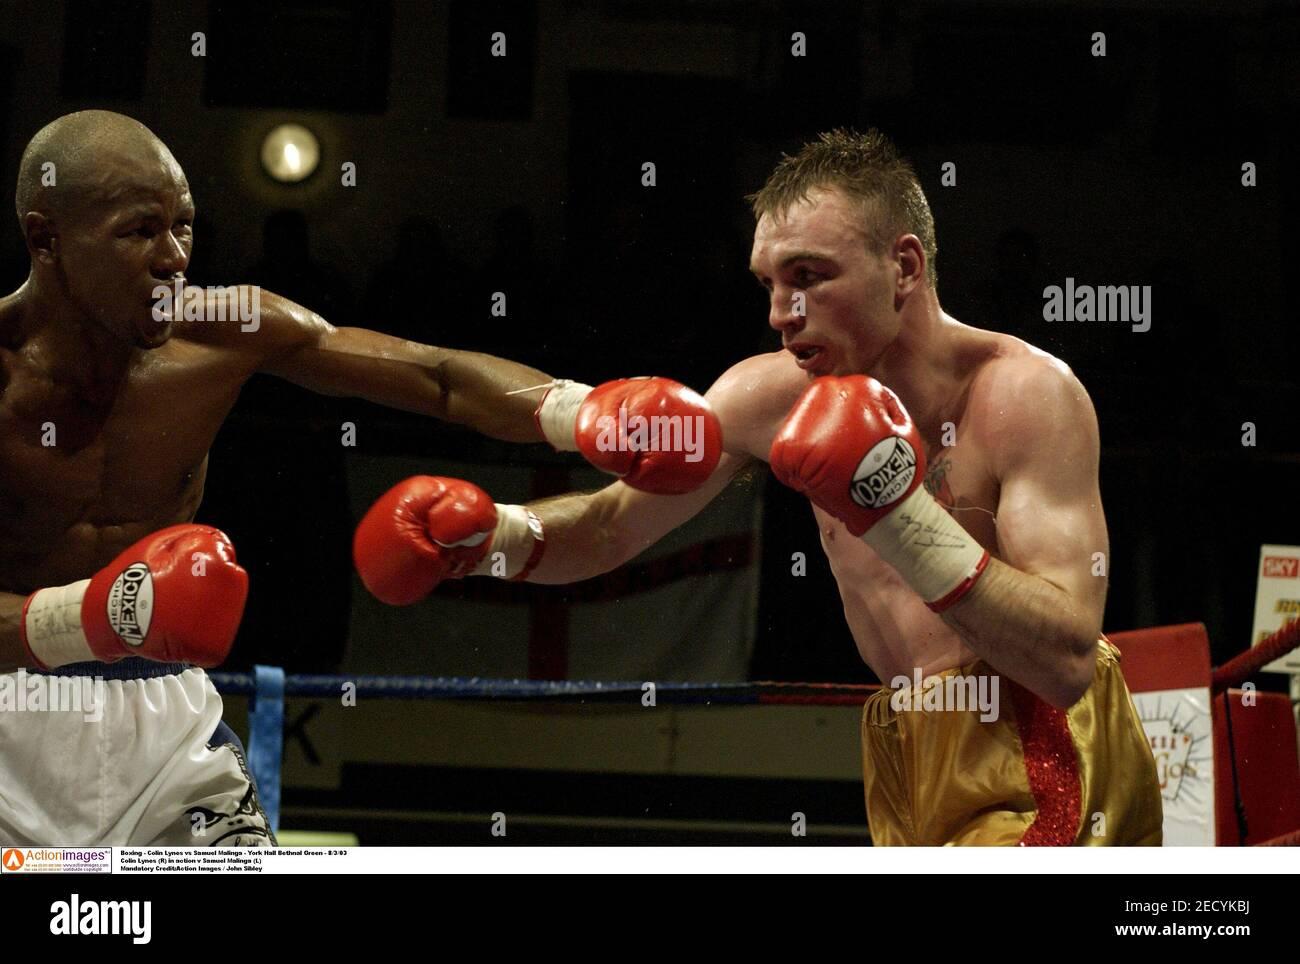 Boxe - Colin Lynes contre Samuel Malinga - York Hall Bethnal Green - 8/3/03 Colin Lynes (R) en action v Samuel Malinga (L) crédit obligatoire:Images d'action / John Sibley Banque D'Images